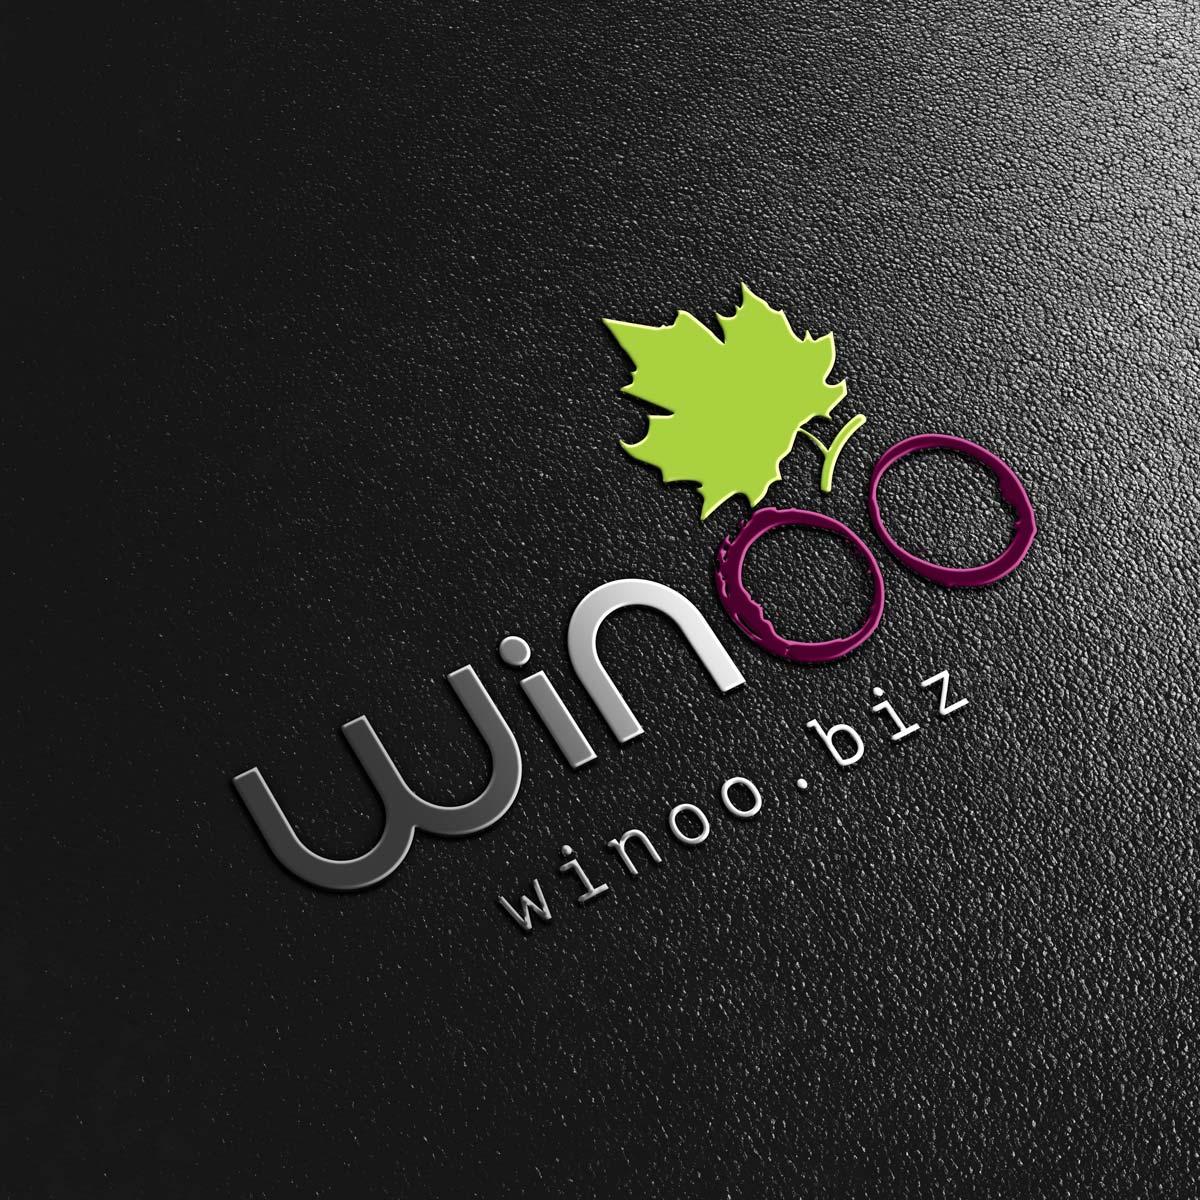 winoo - Mockup -Brand design by Brandizle